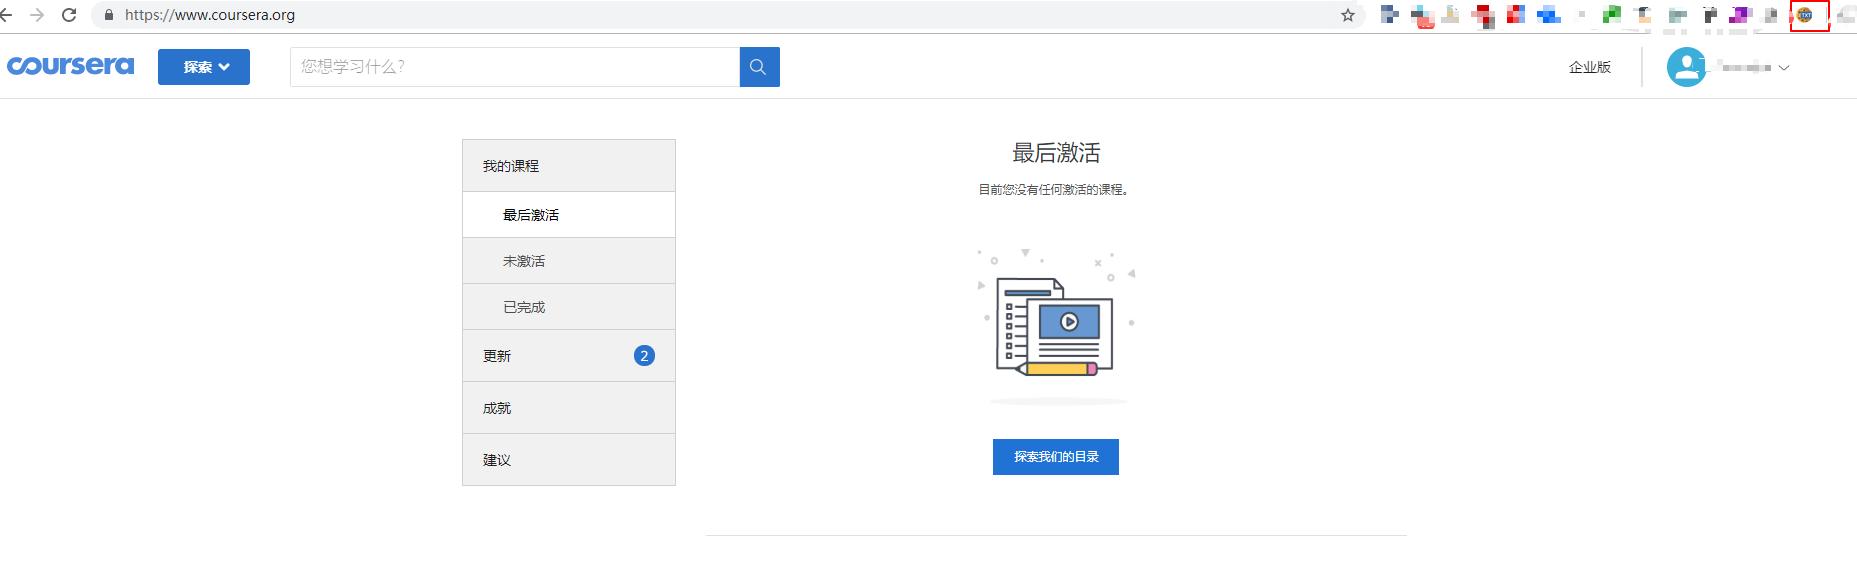 HTTPError: 400 Client Error: Bad Request for url: https